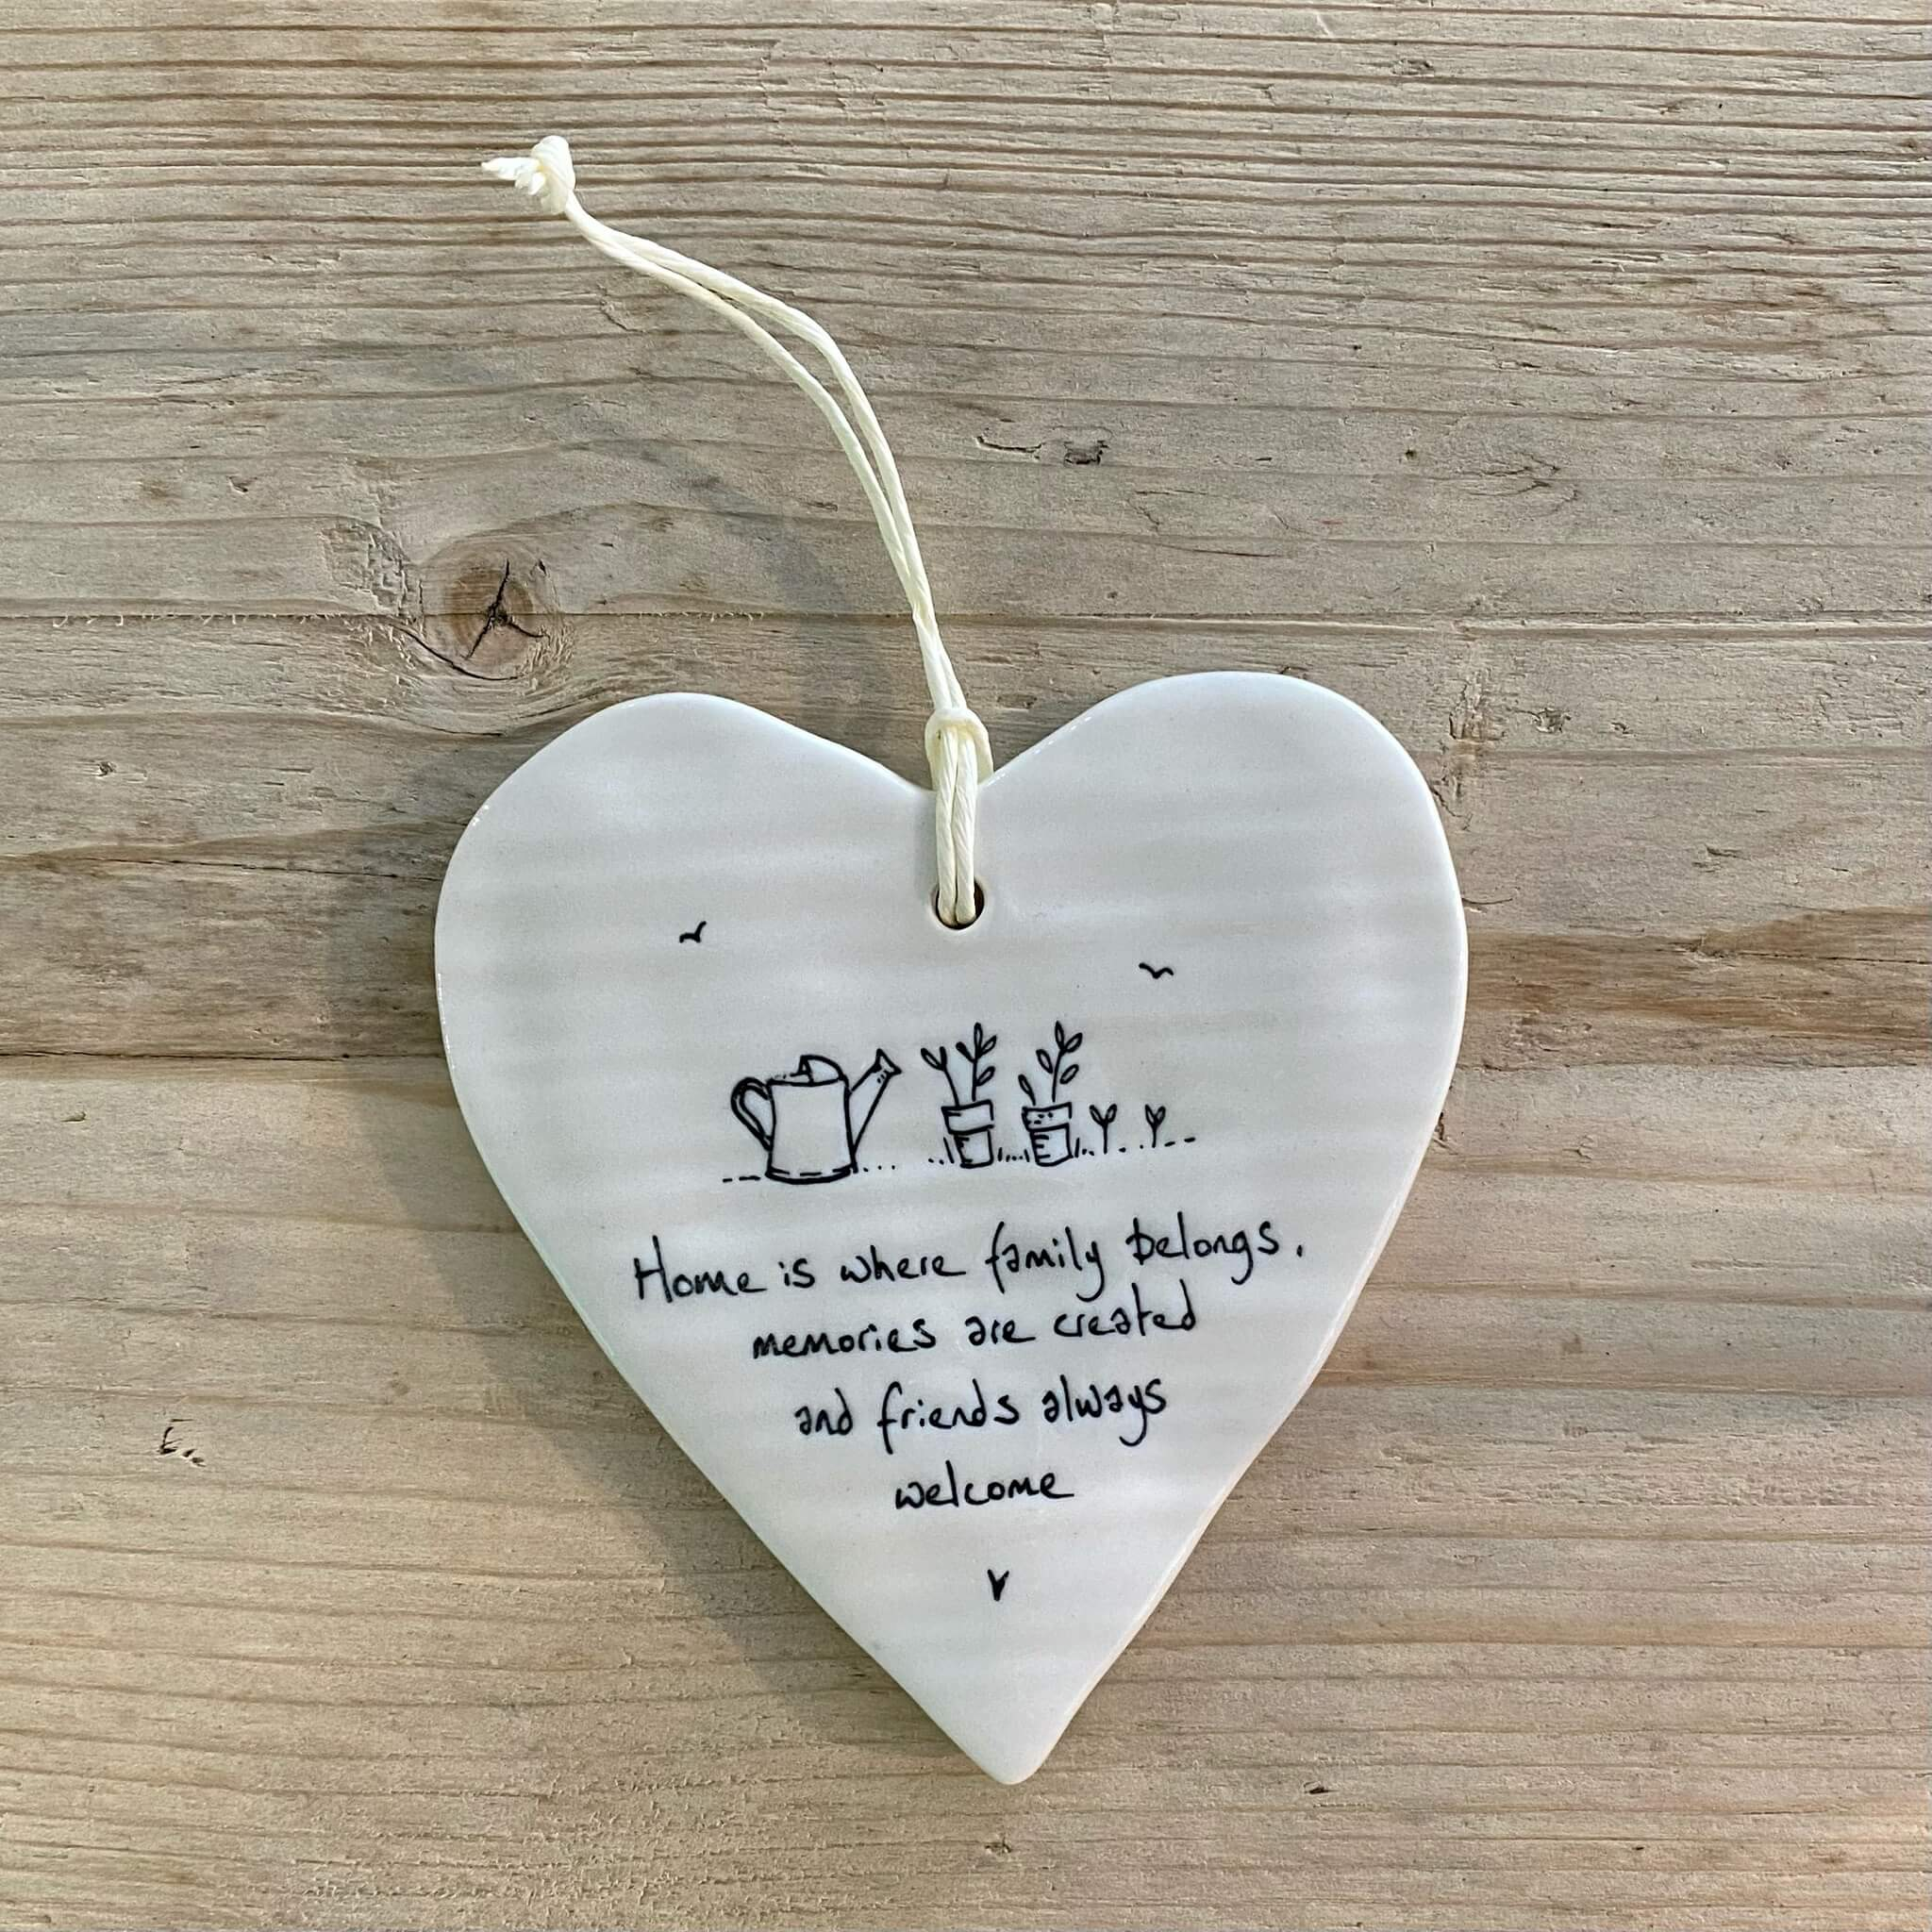 Porcelain Heart - Family belongs